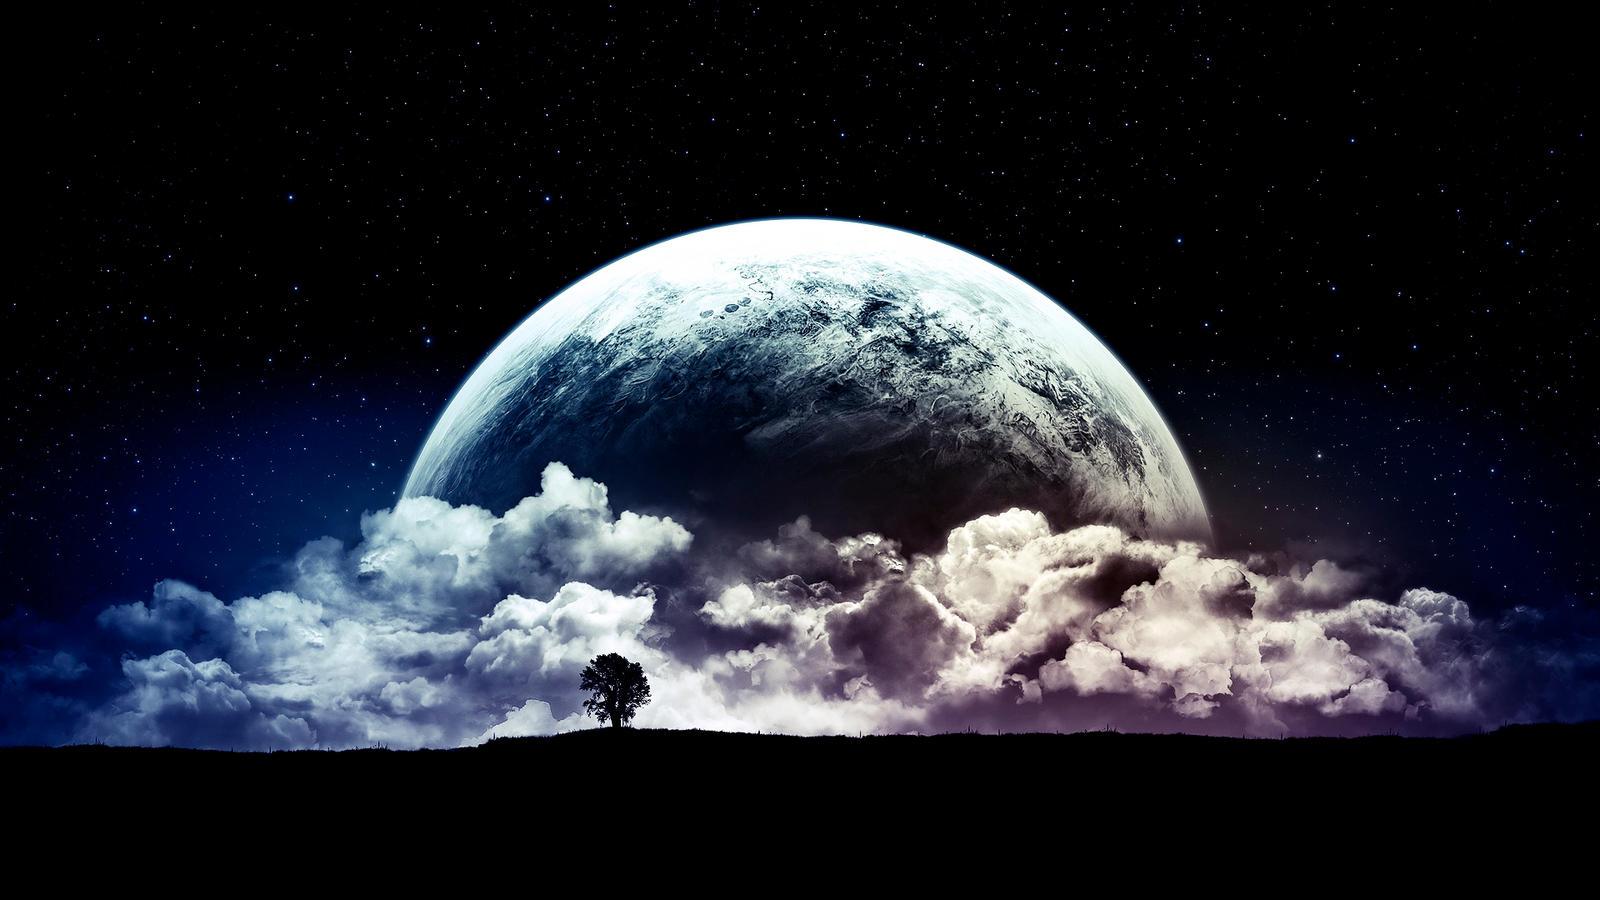 Another World [Wallpaper] 1080p 16:9